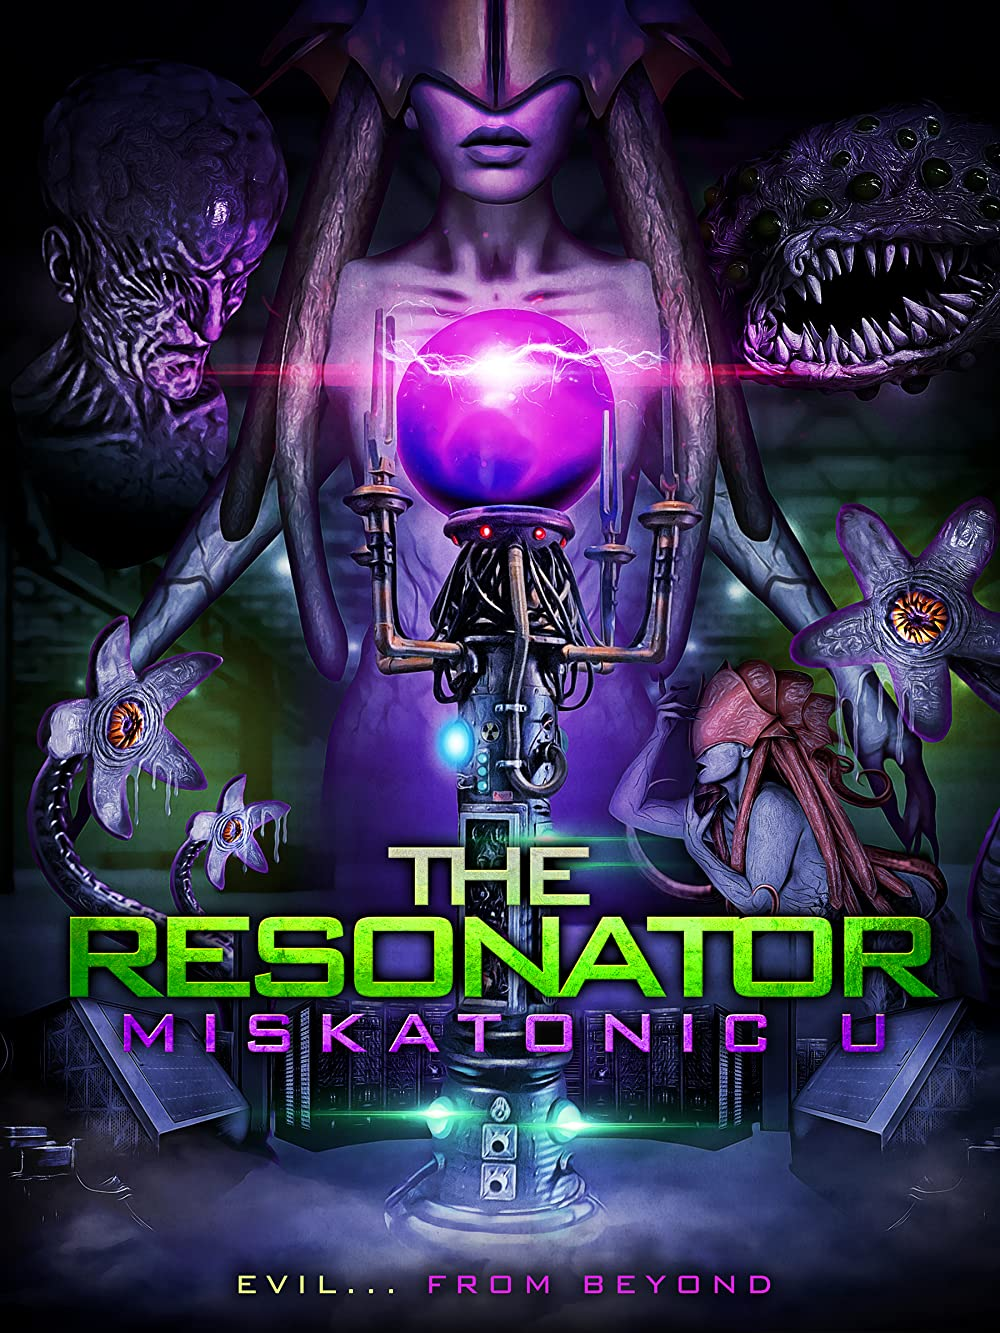 Download The Resonator: Miskatonic U (2021) Full Movie [In English] With Hindi Subtitles | WebRip 720p [1XBET] FREE on 1XCinema.com & KatMovieHD.sk